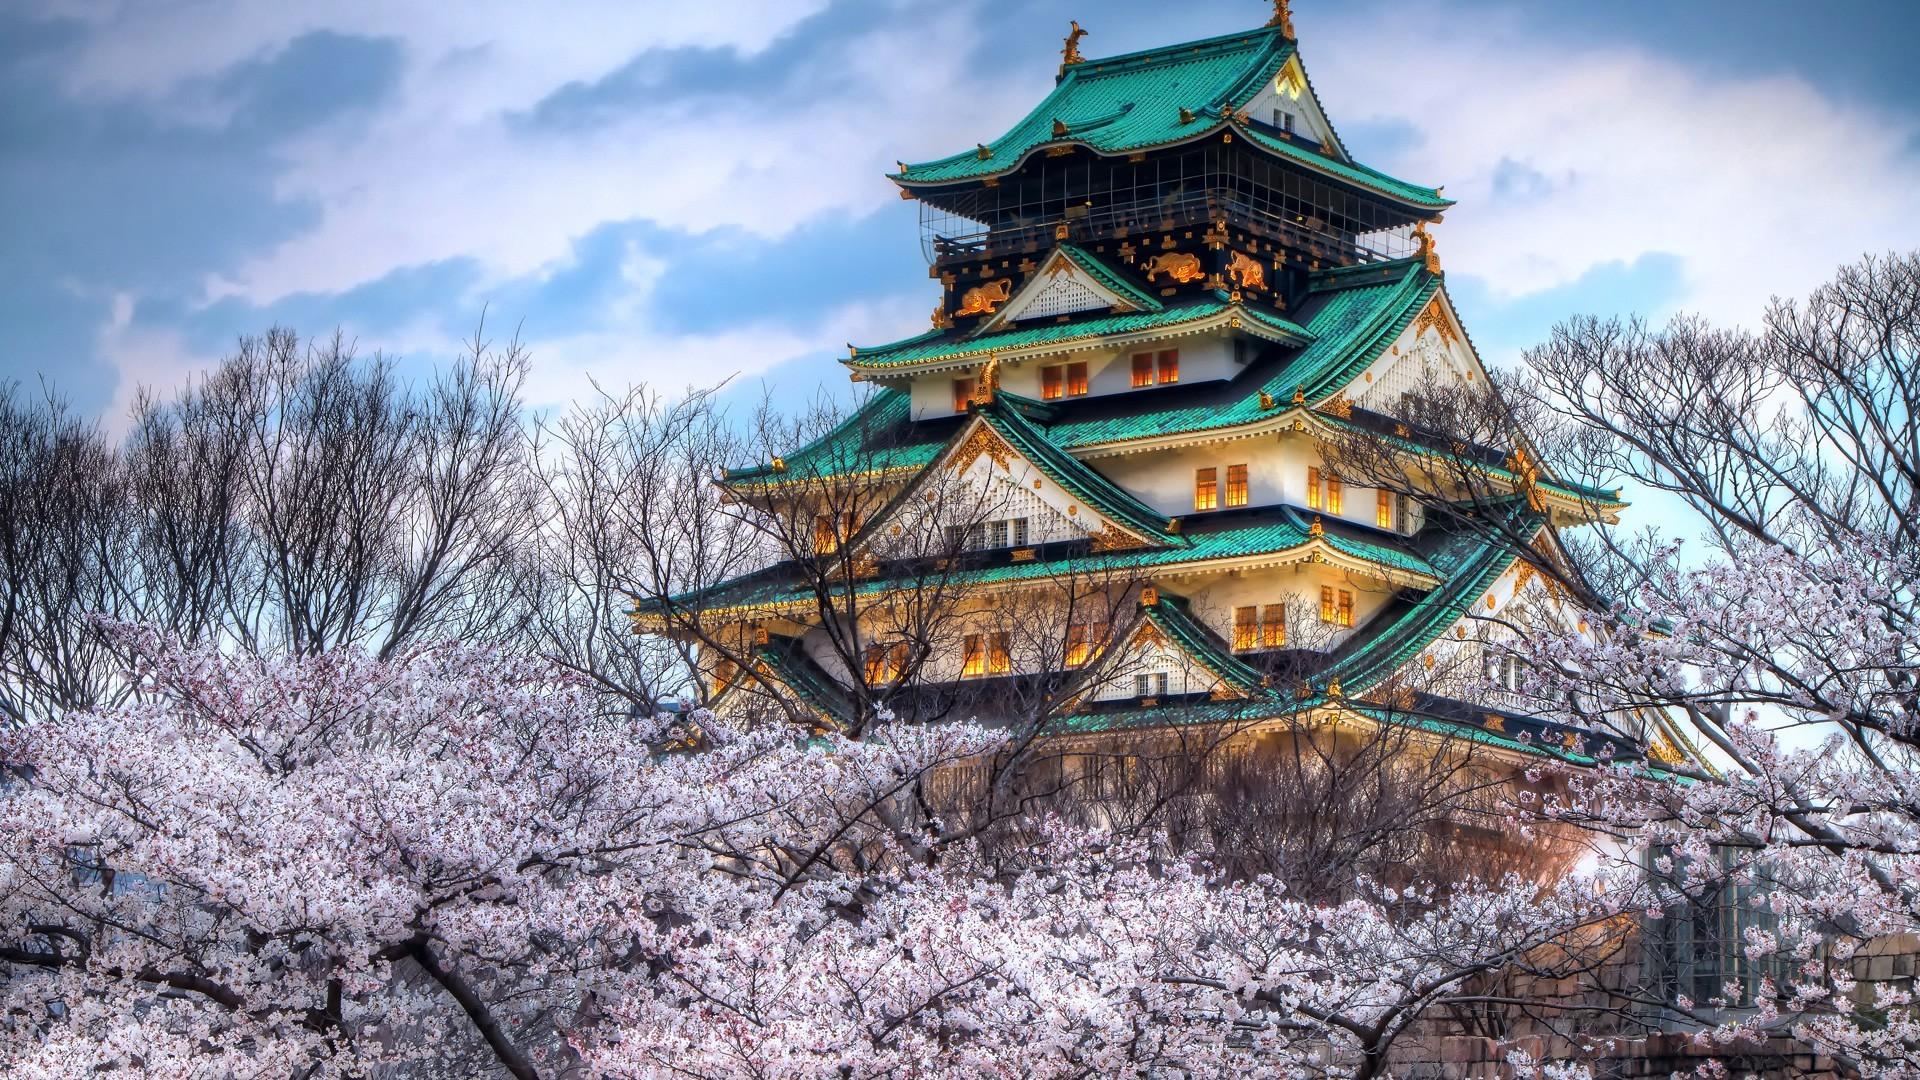 General 1920x1080 cherry blossom Japan Osaka Castle